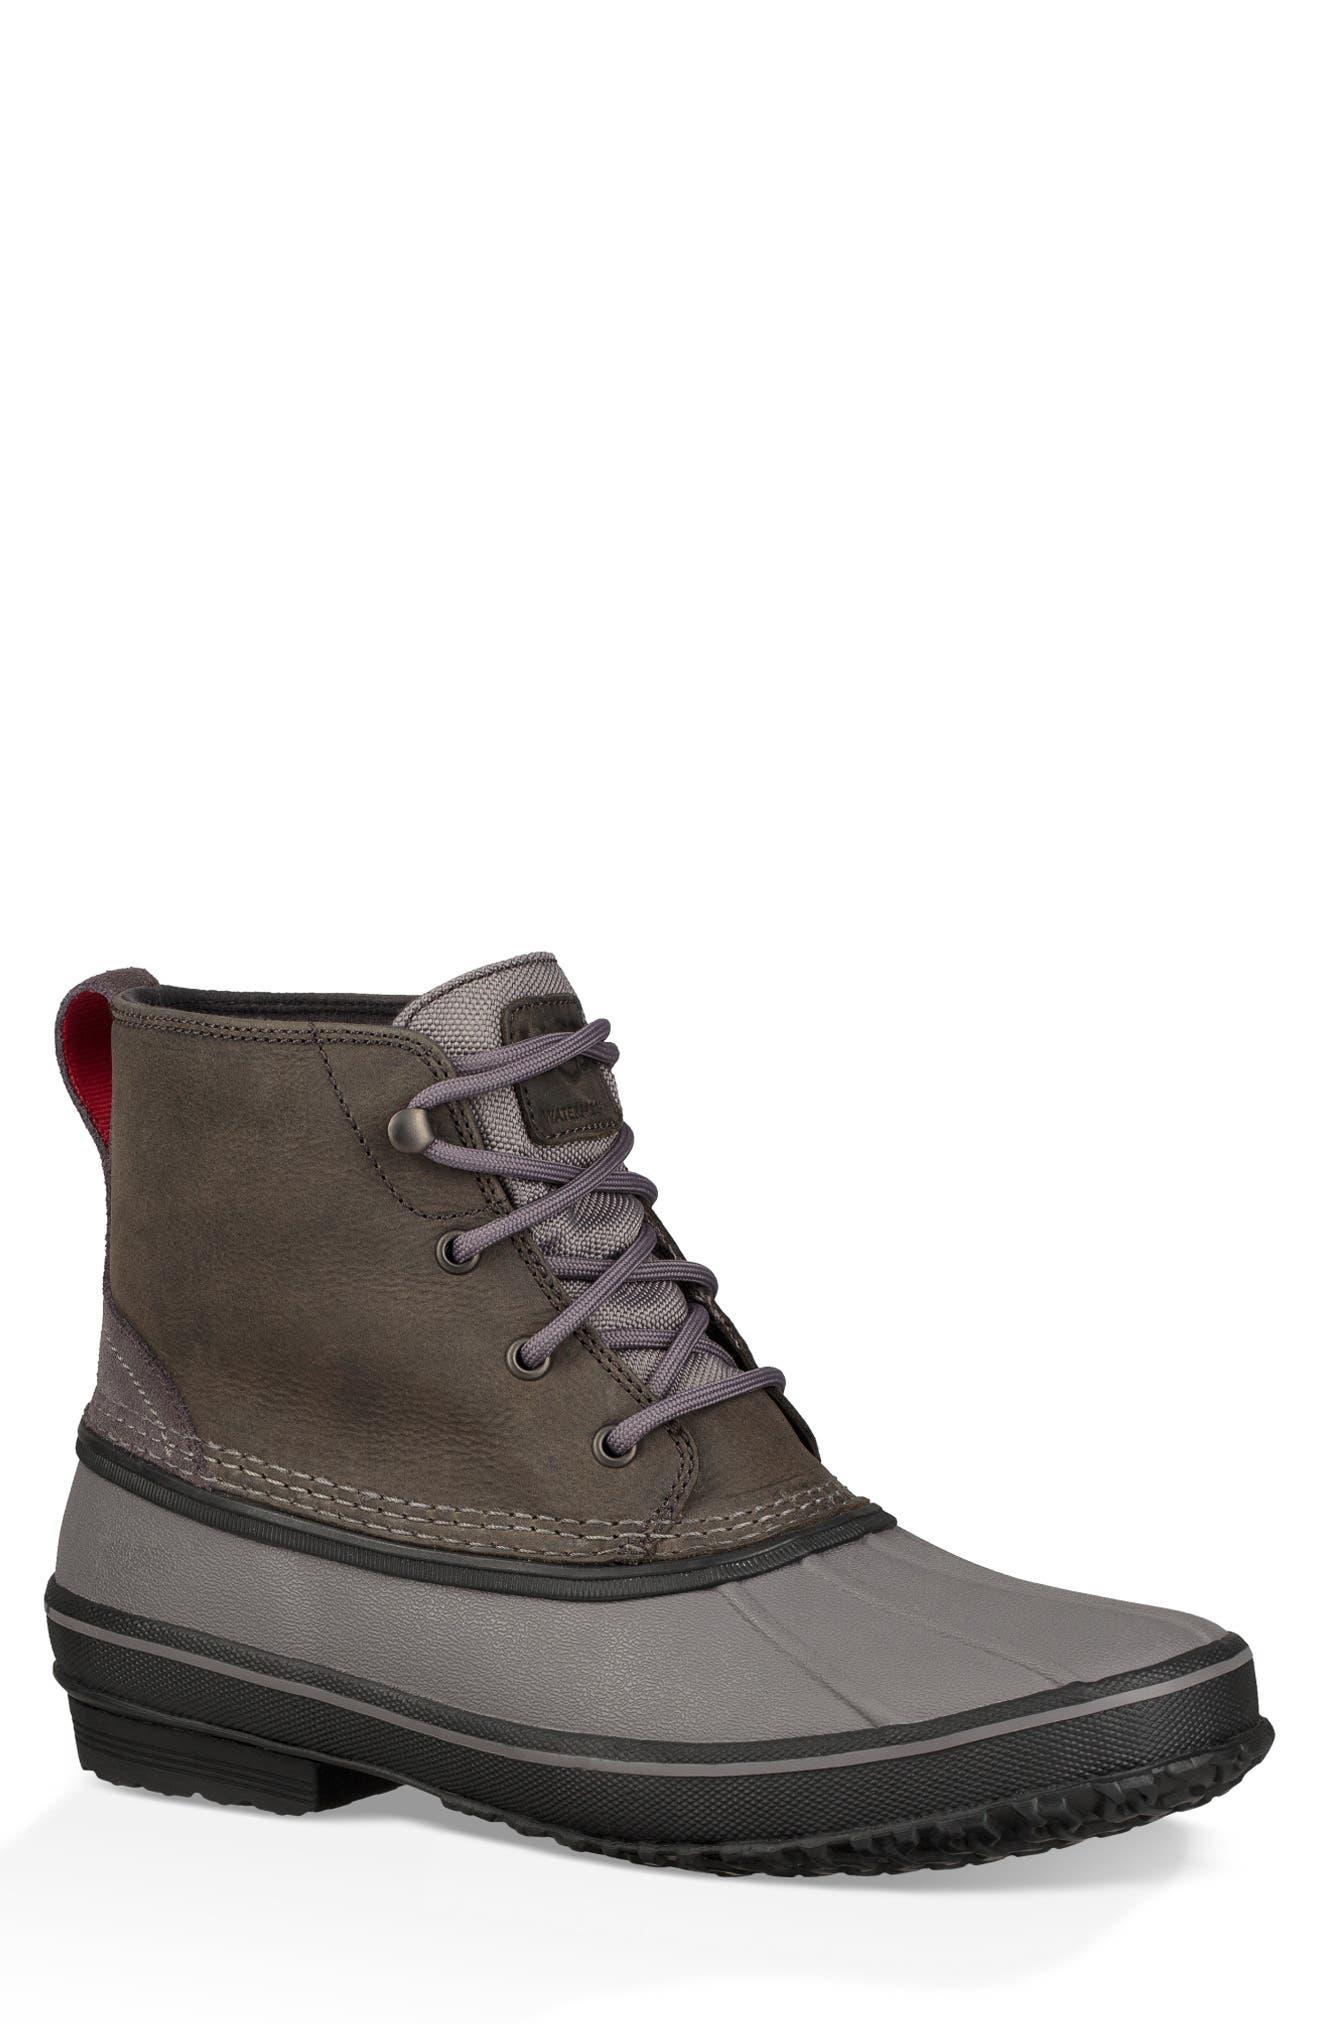 Zetik Rain Boot,                         Main,                         color, DARK GREY